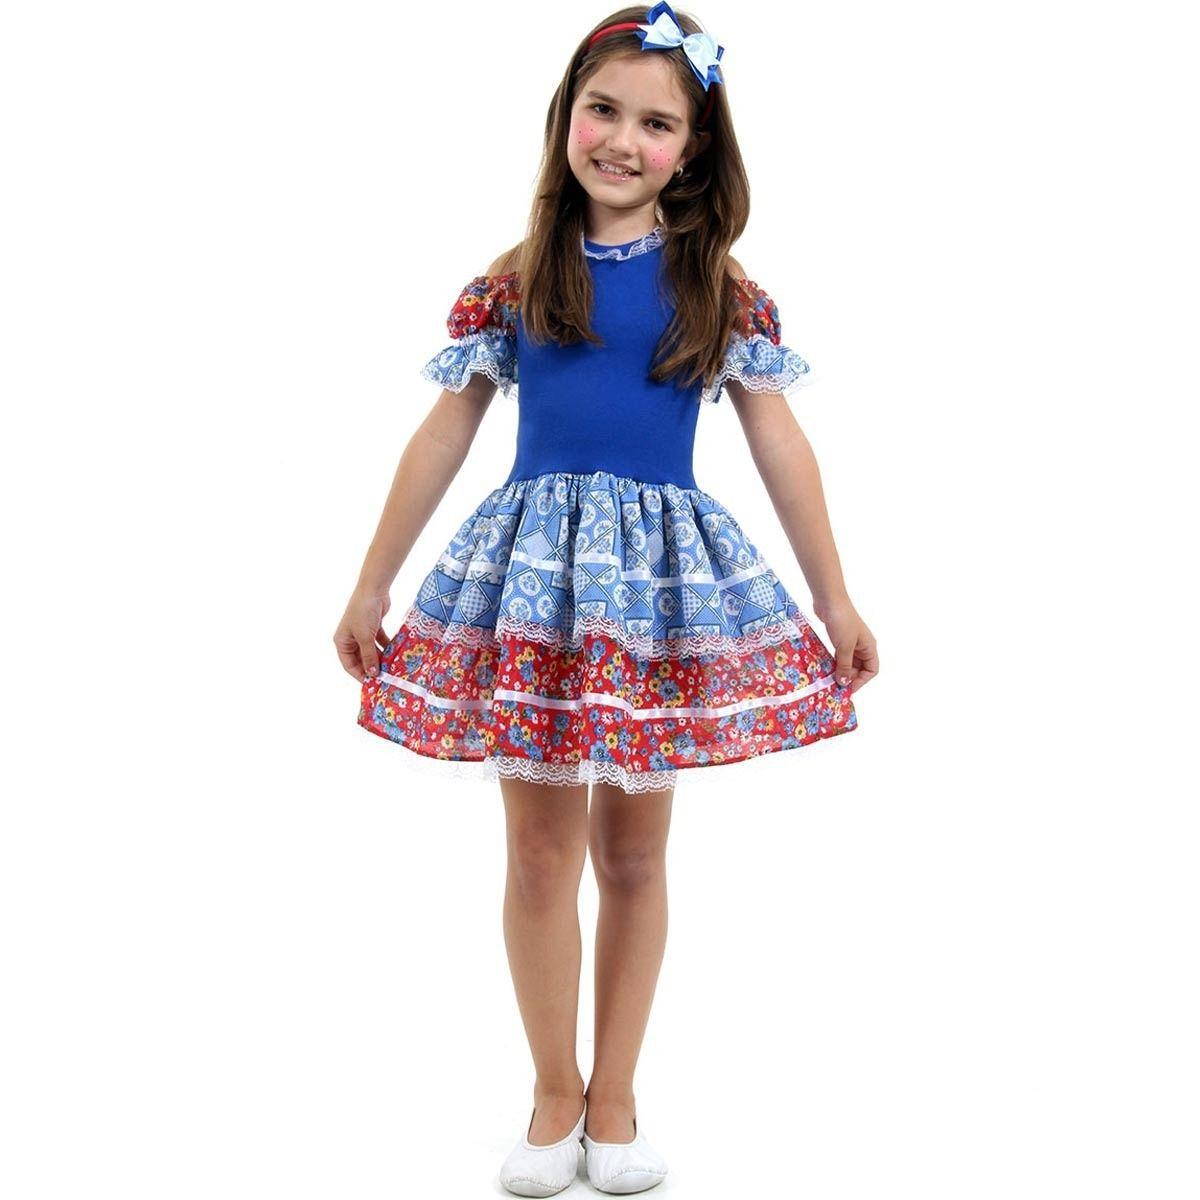 Fantasia Caipira Infantil C/ Tiara Caipira Ana Julia Sulamericana